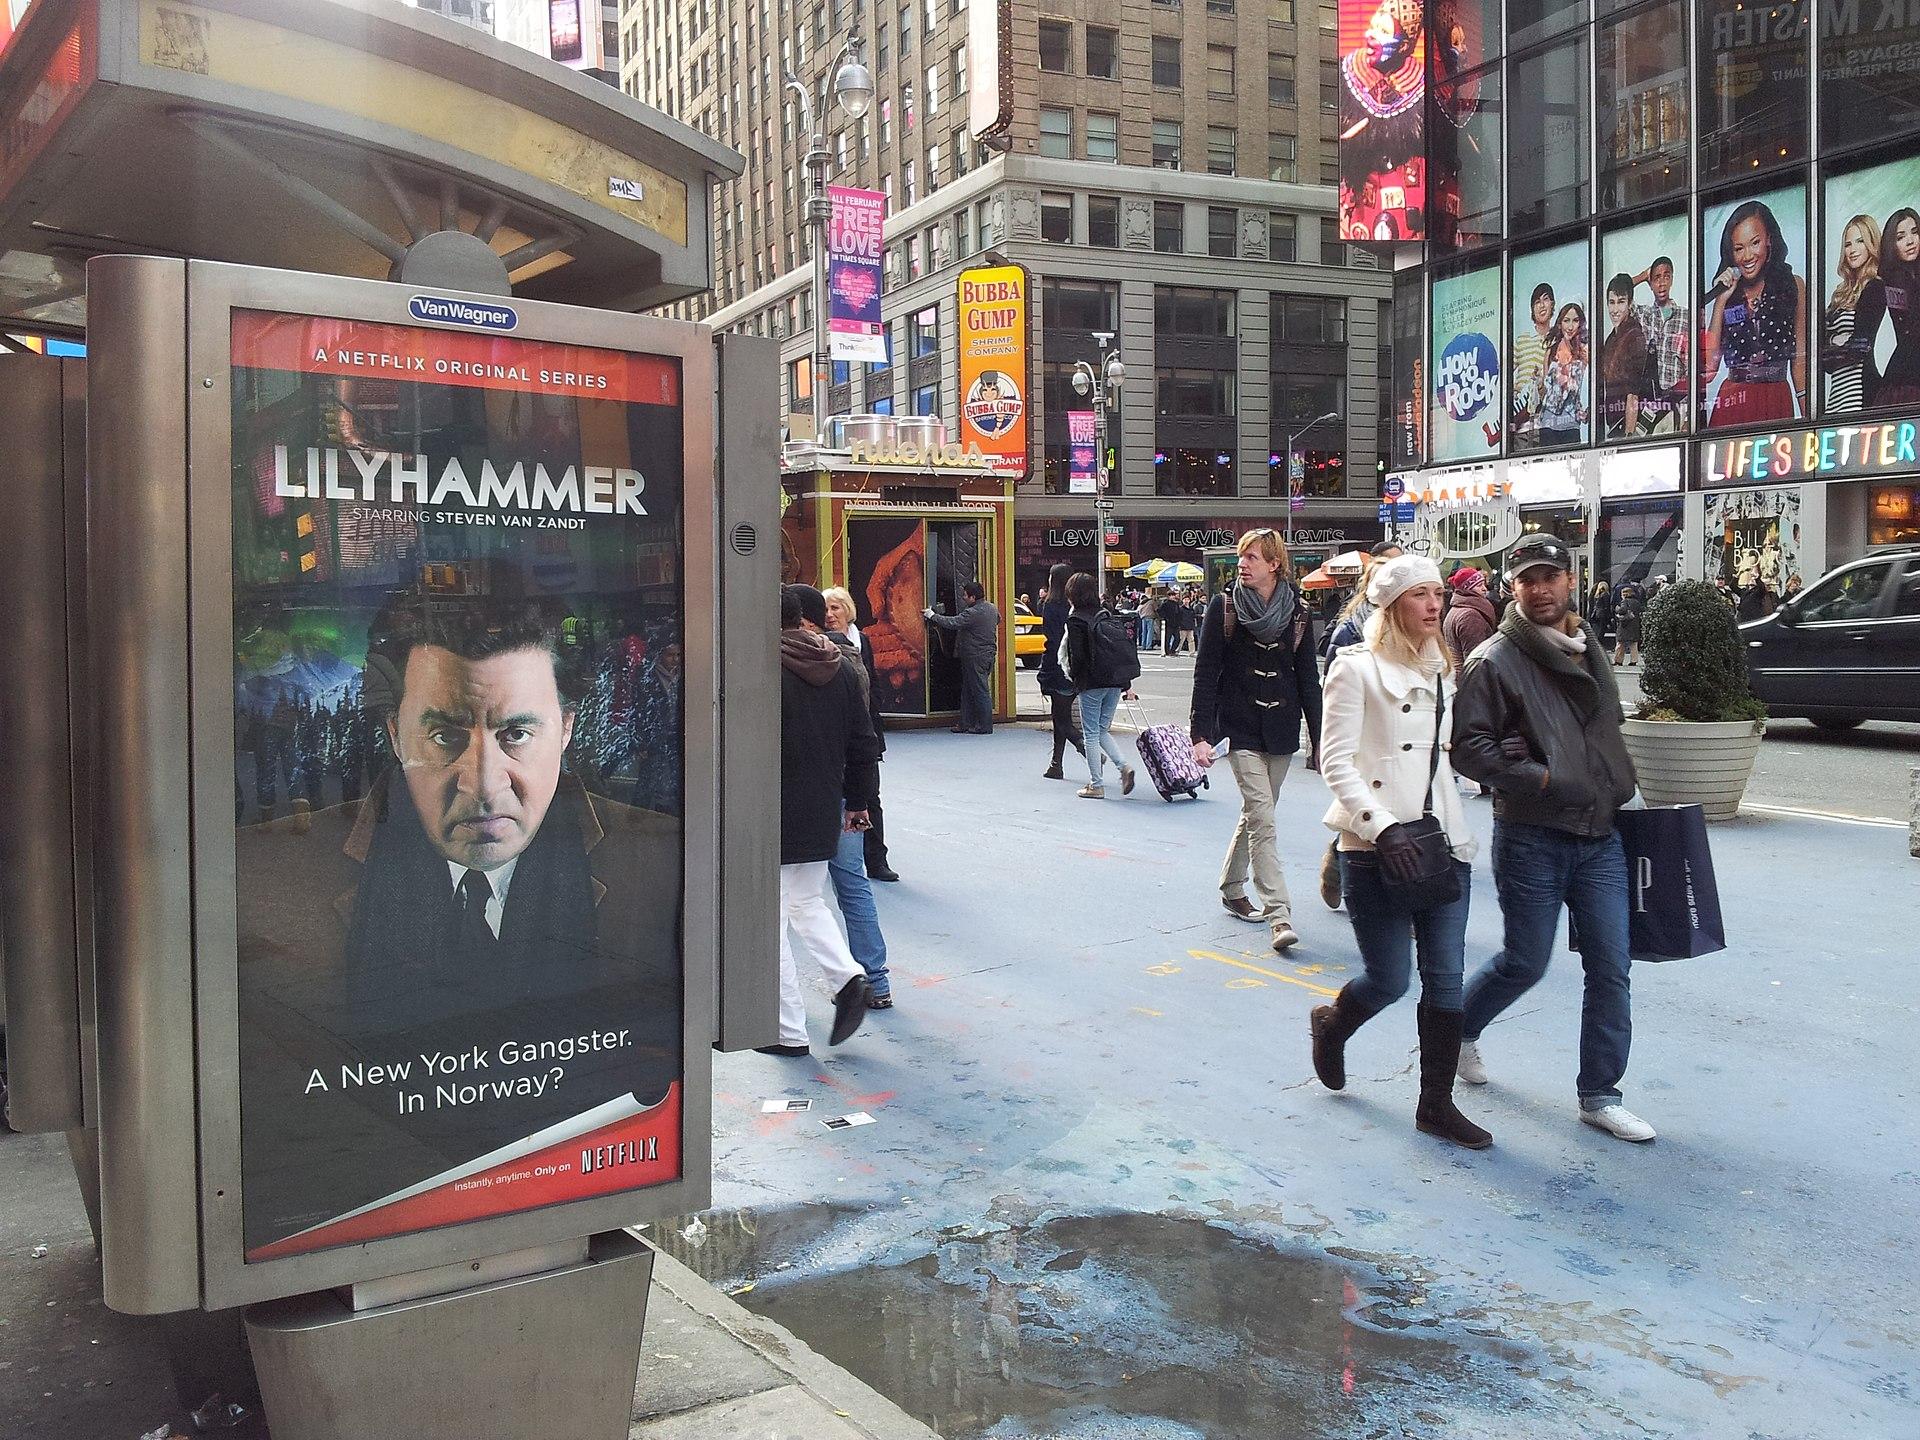 Lillyhammer